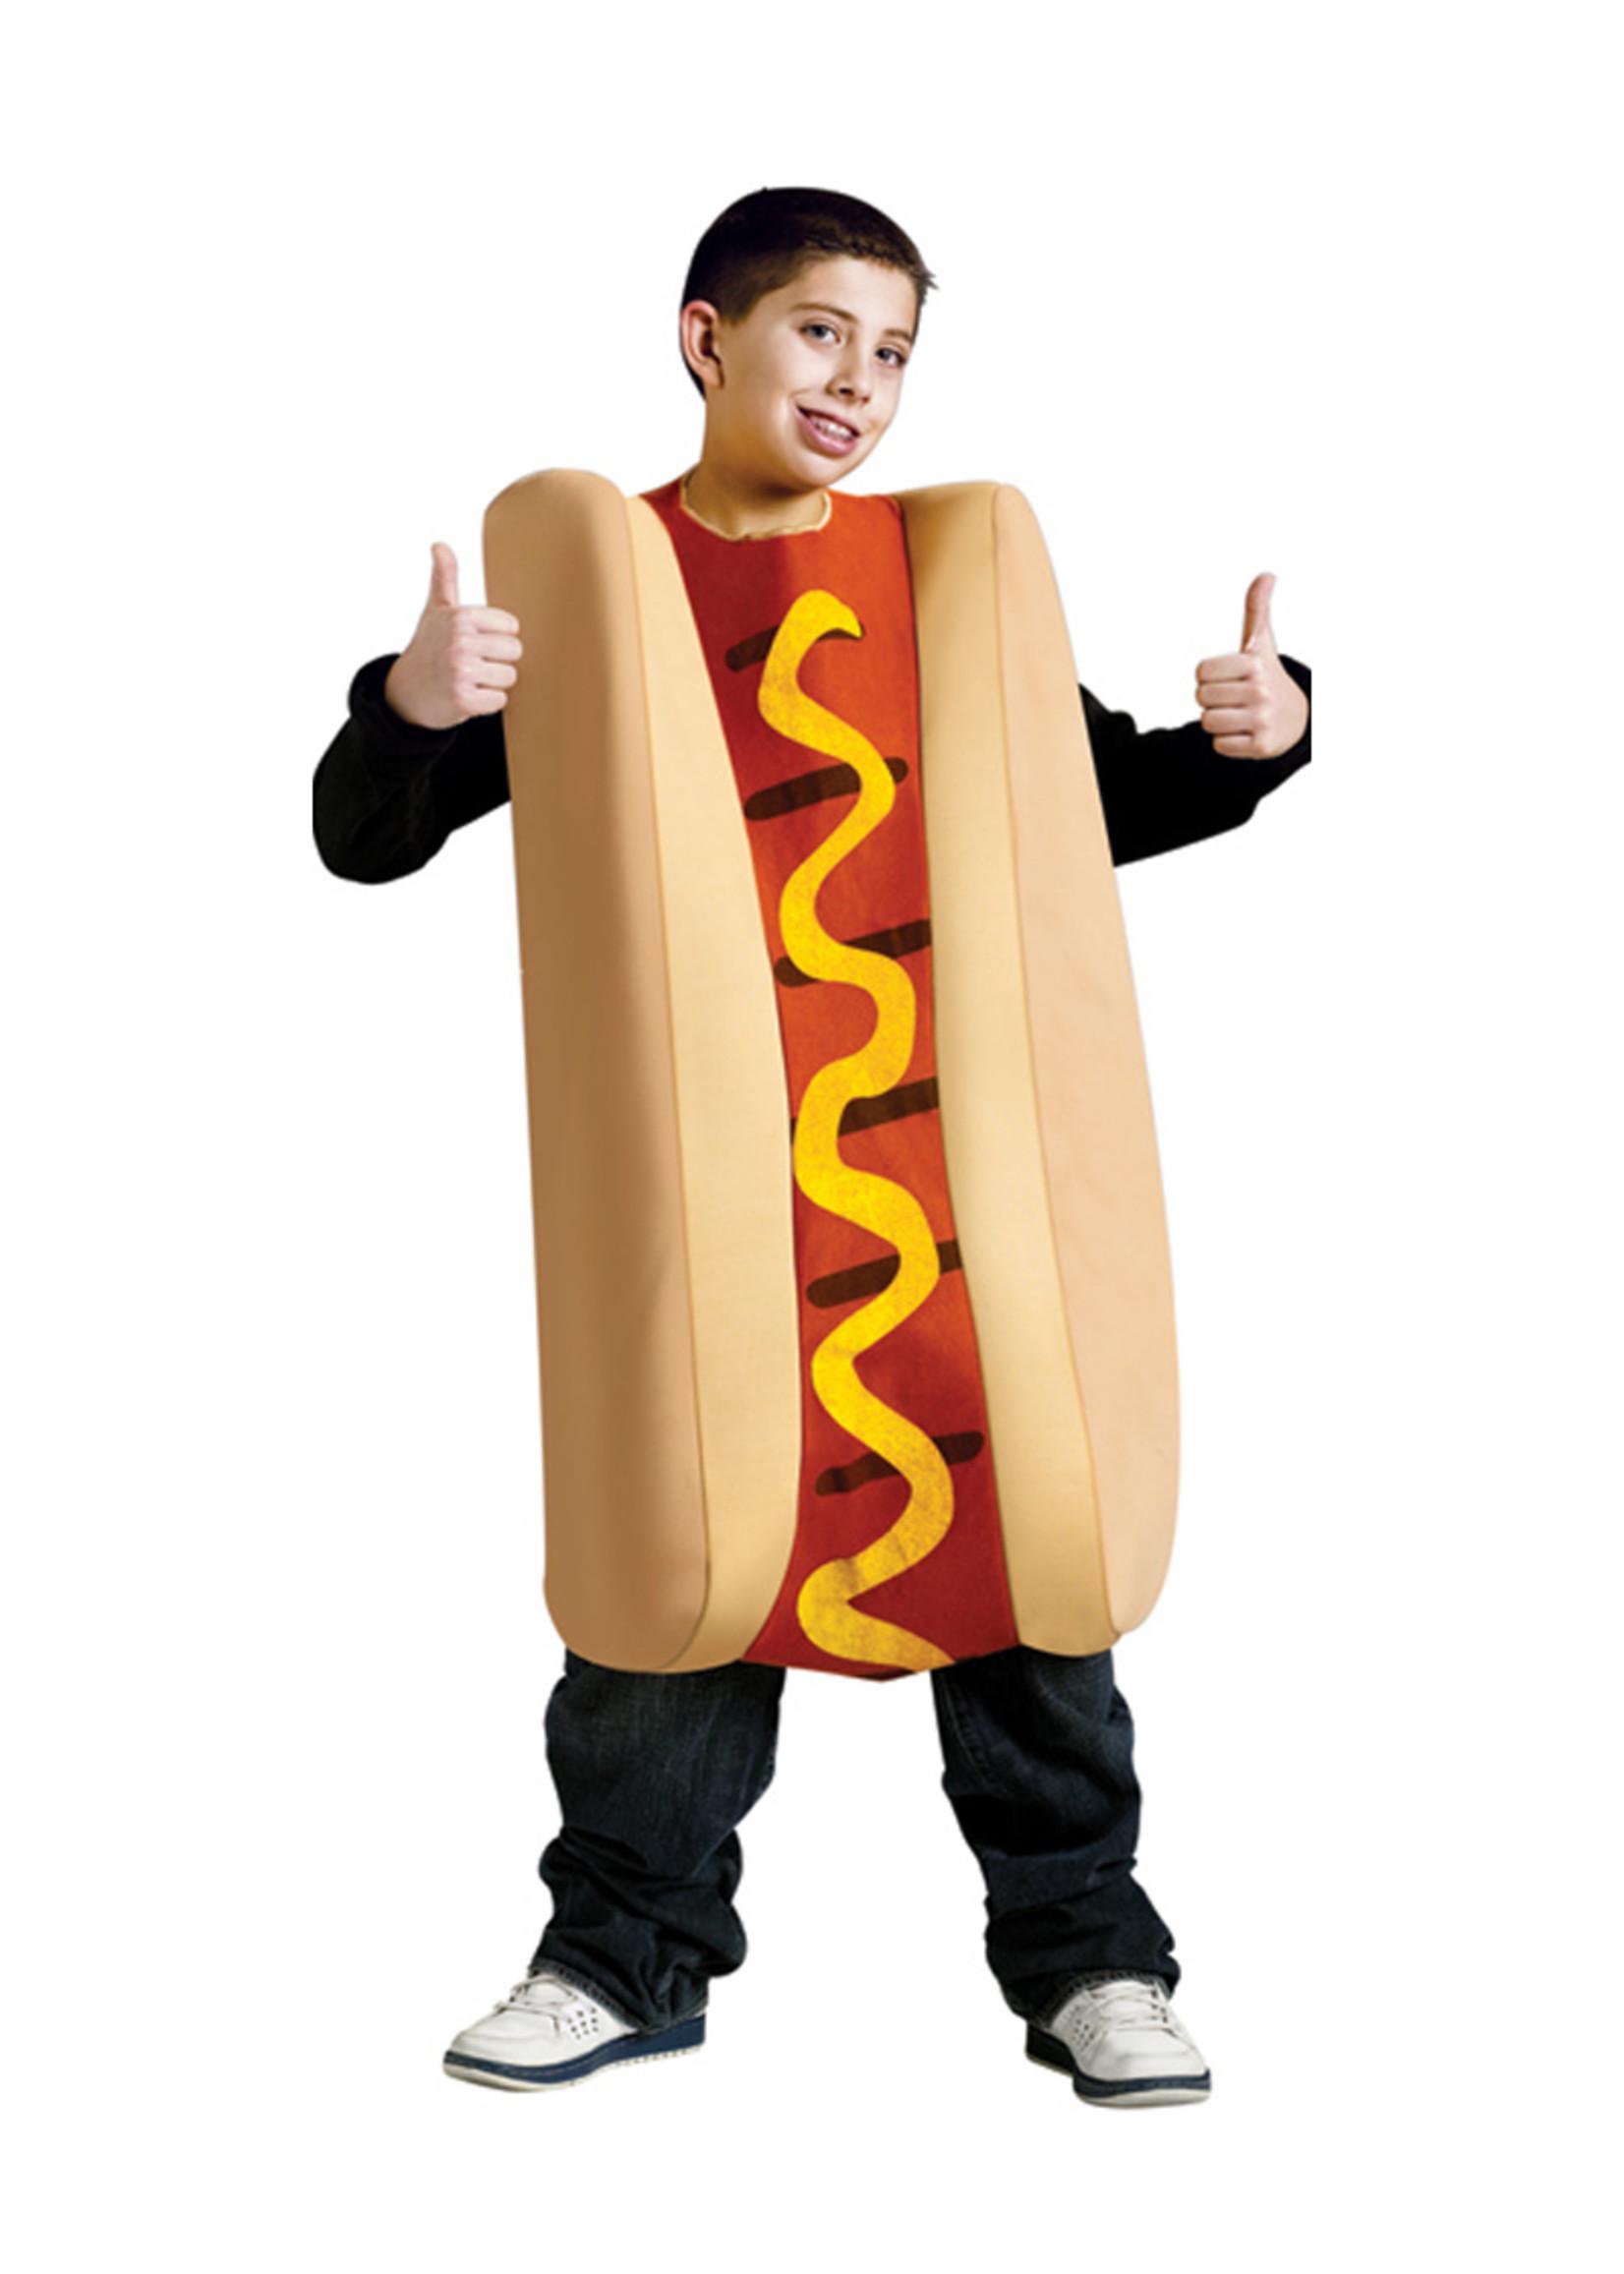 Hot Dog Costume - Boys